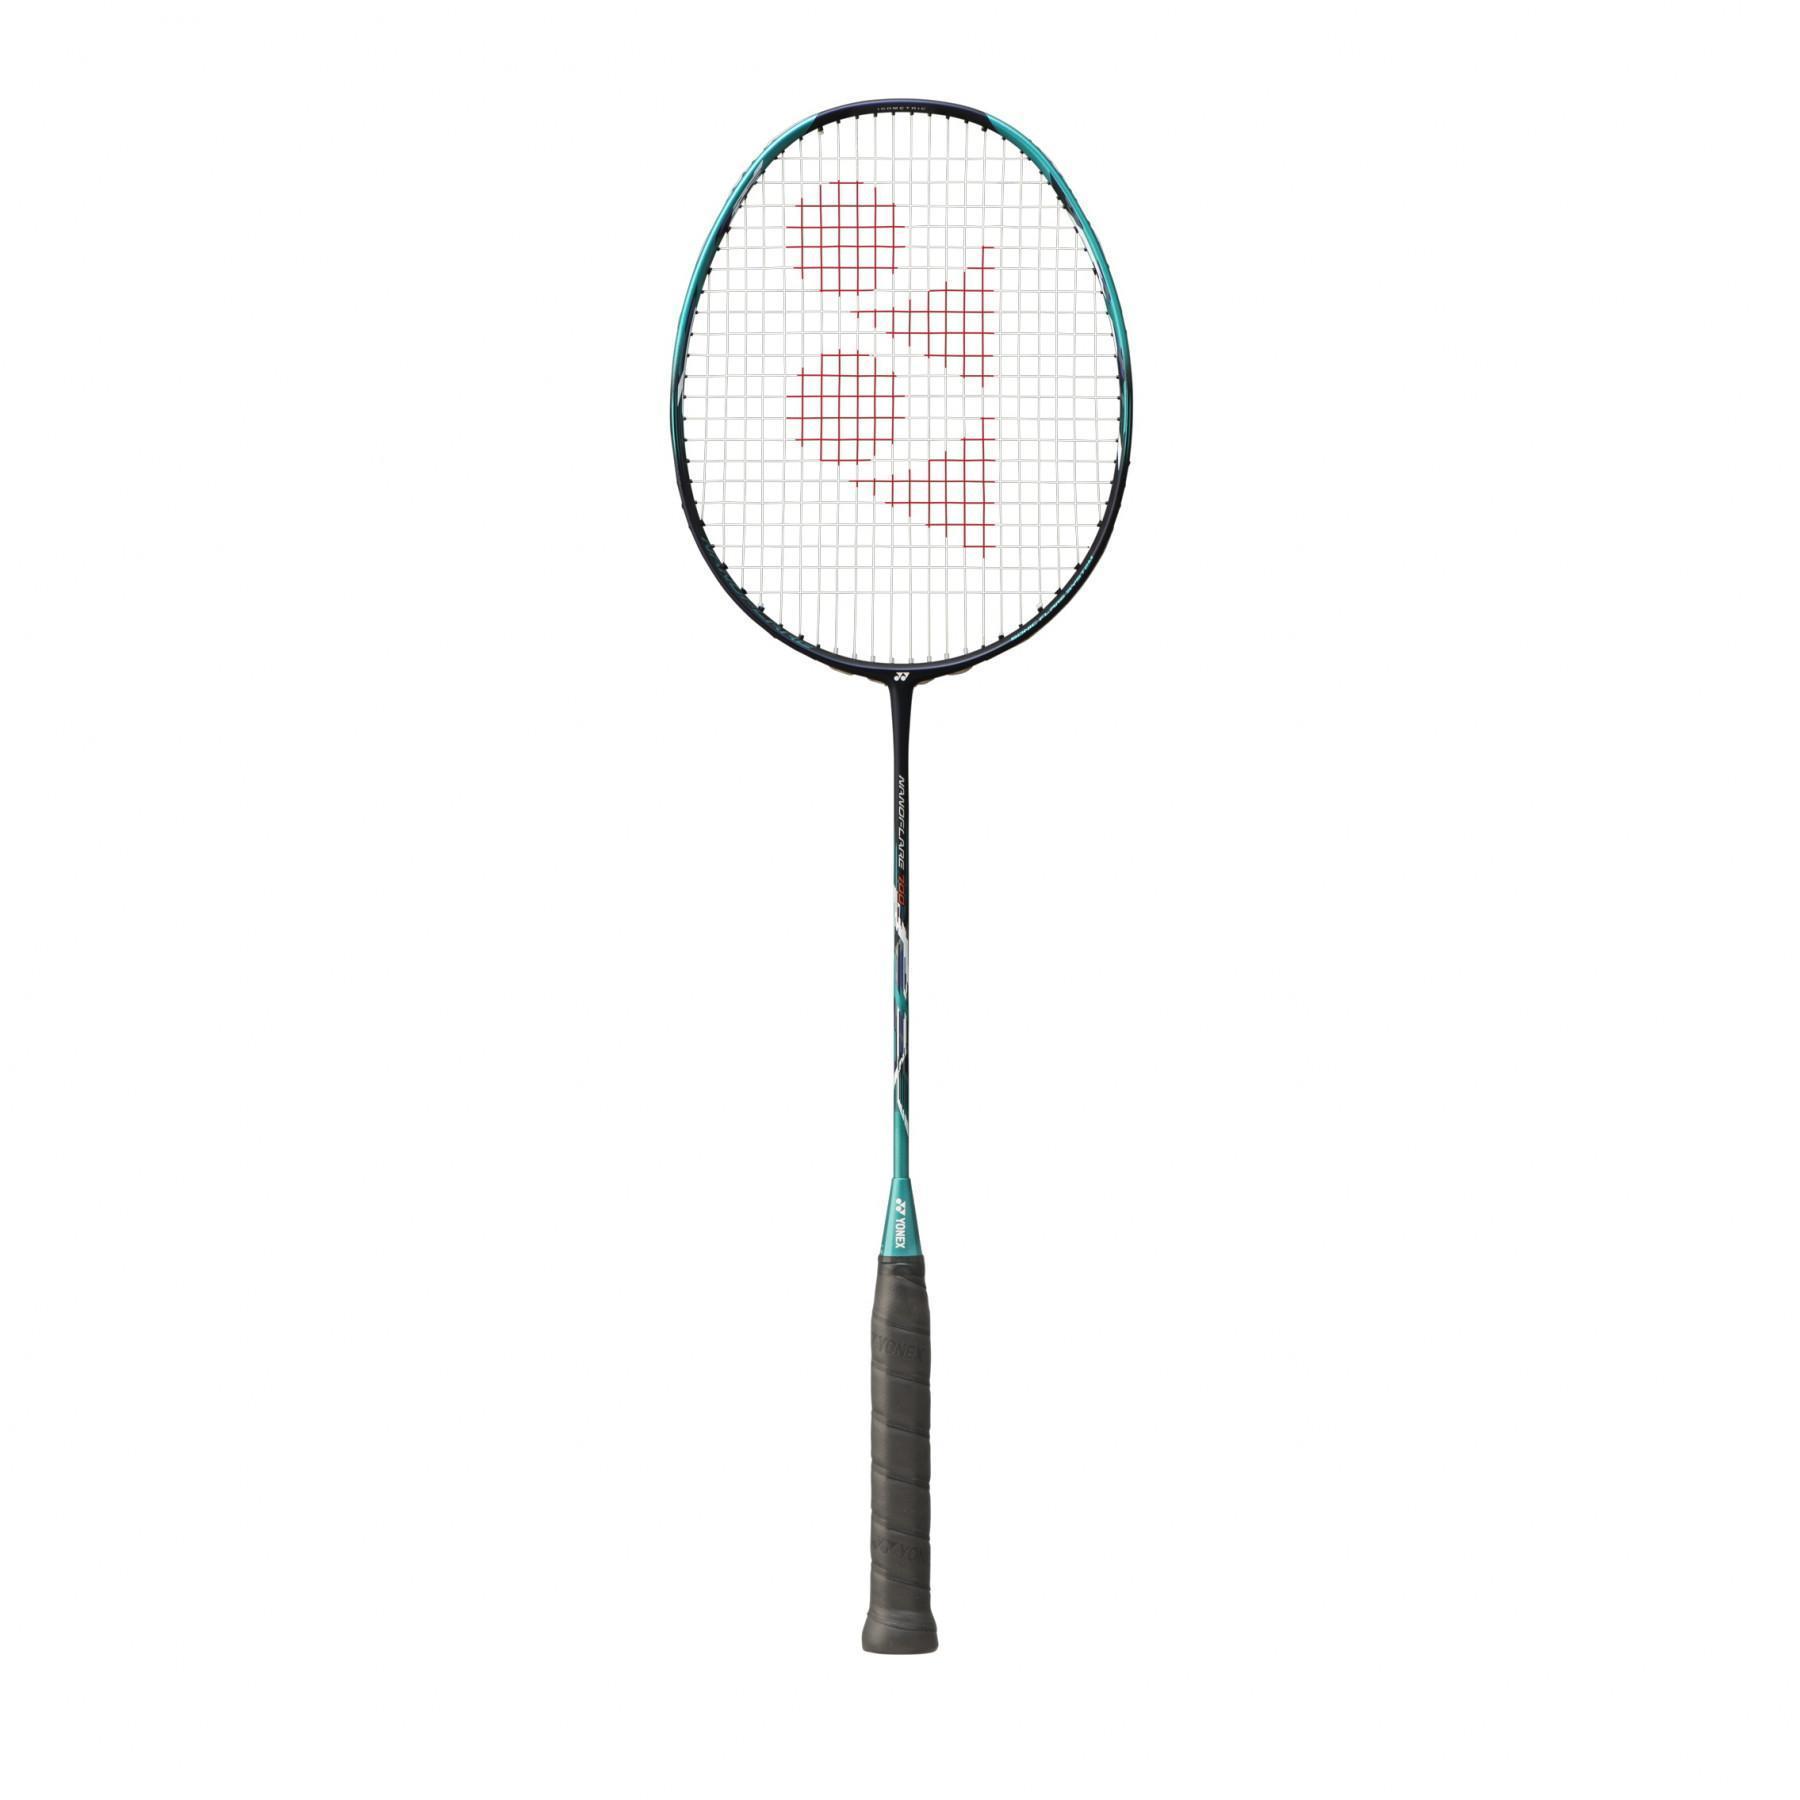 Unstrung Yonex nanoflare 700 4u4 Racquets